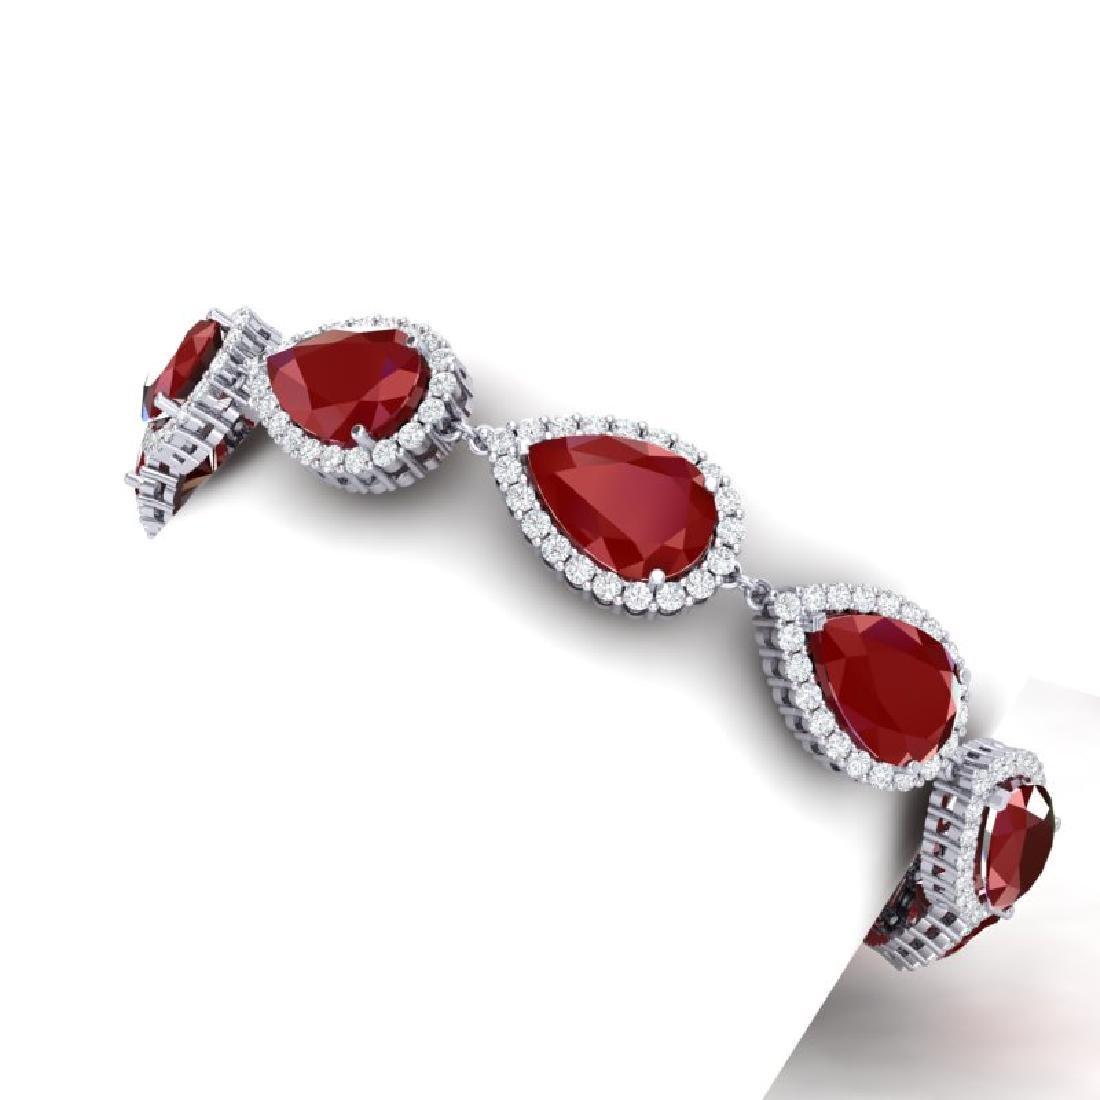 42 CTW Royalty Designer Ruby & VS Diamond Bracelet 18K - 2